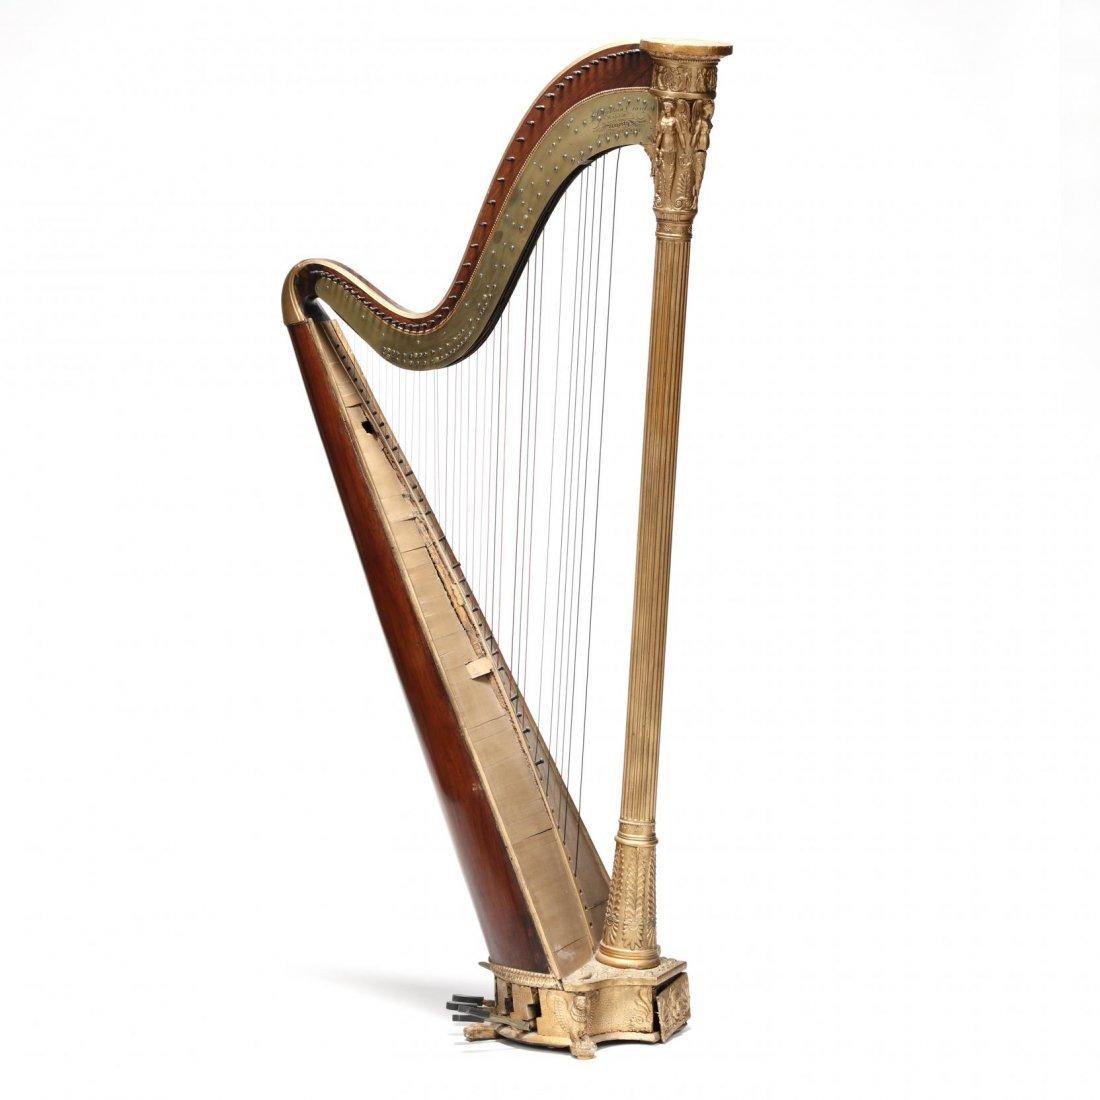 Regency Parcel Gilt Harp by Sebastian Erard